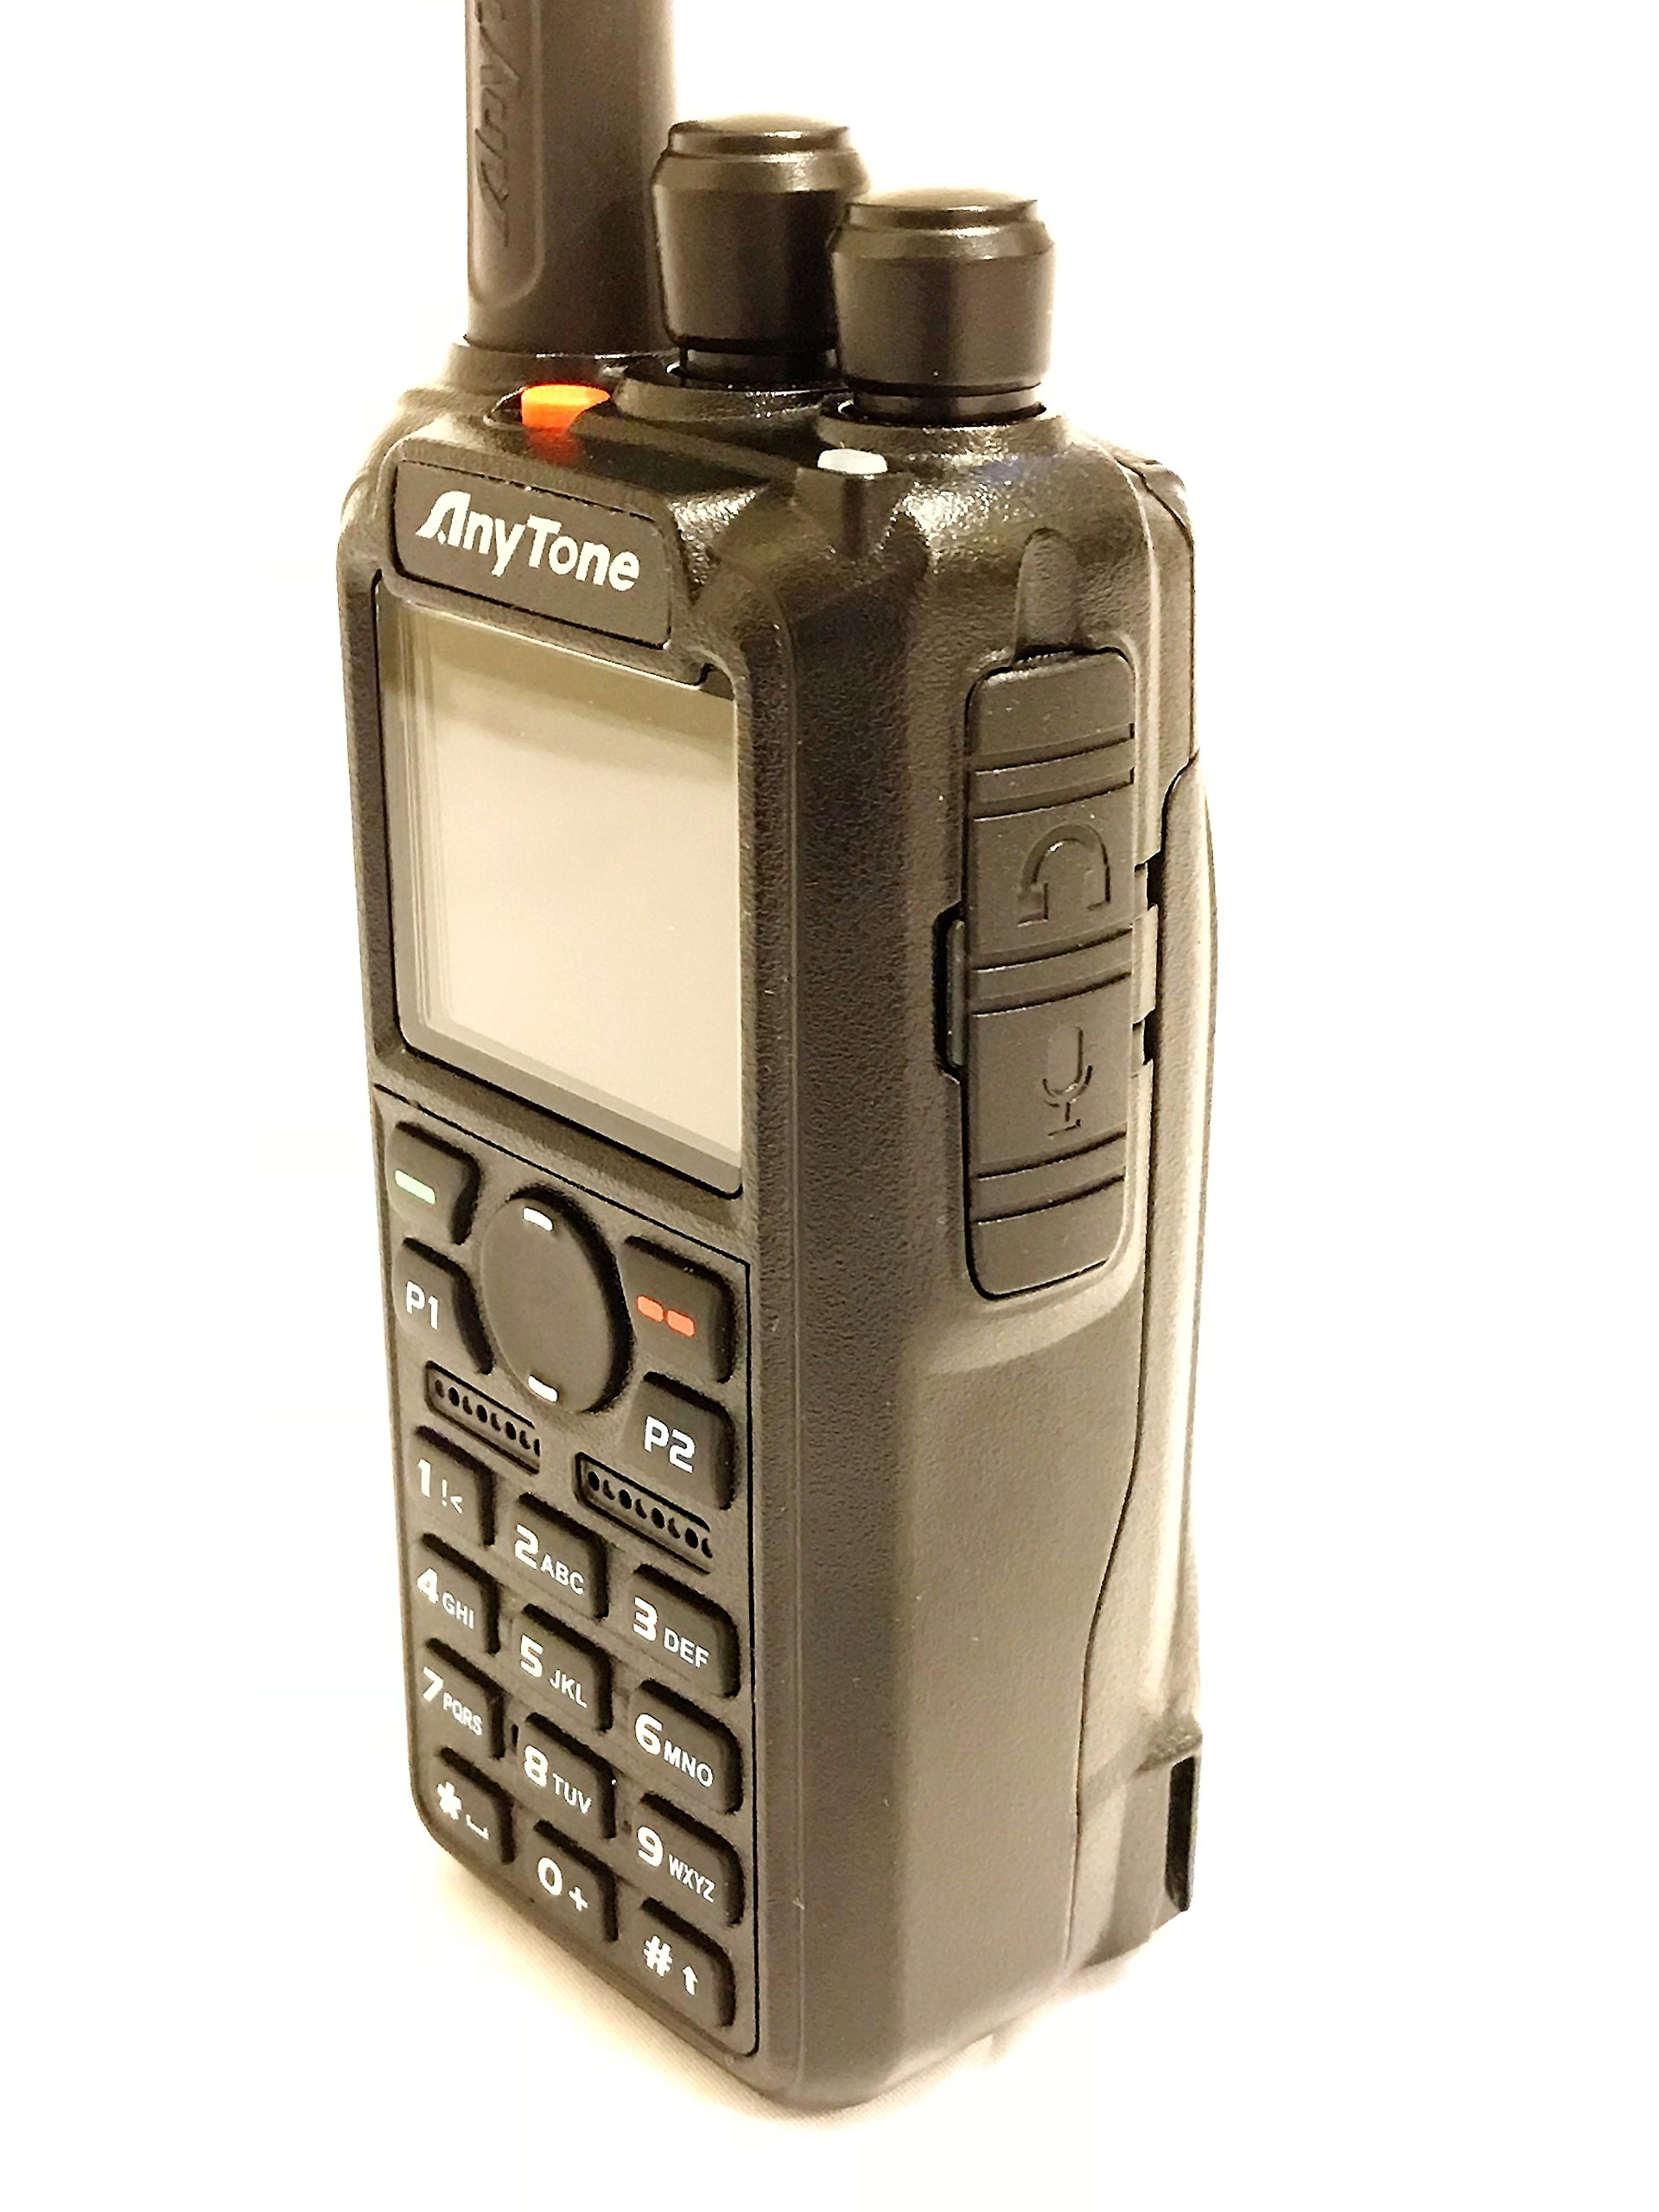 AnyTone AT-D868UV GPS Version II Upgraded 3100mAh battery Dual Band DMR/Analog 144 & 430 MHz Radio US Seller by AnyTone (Image #5)